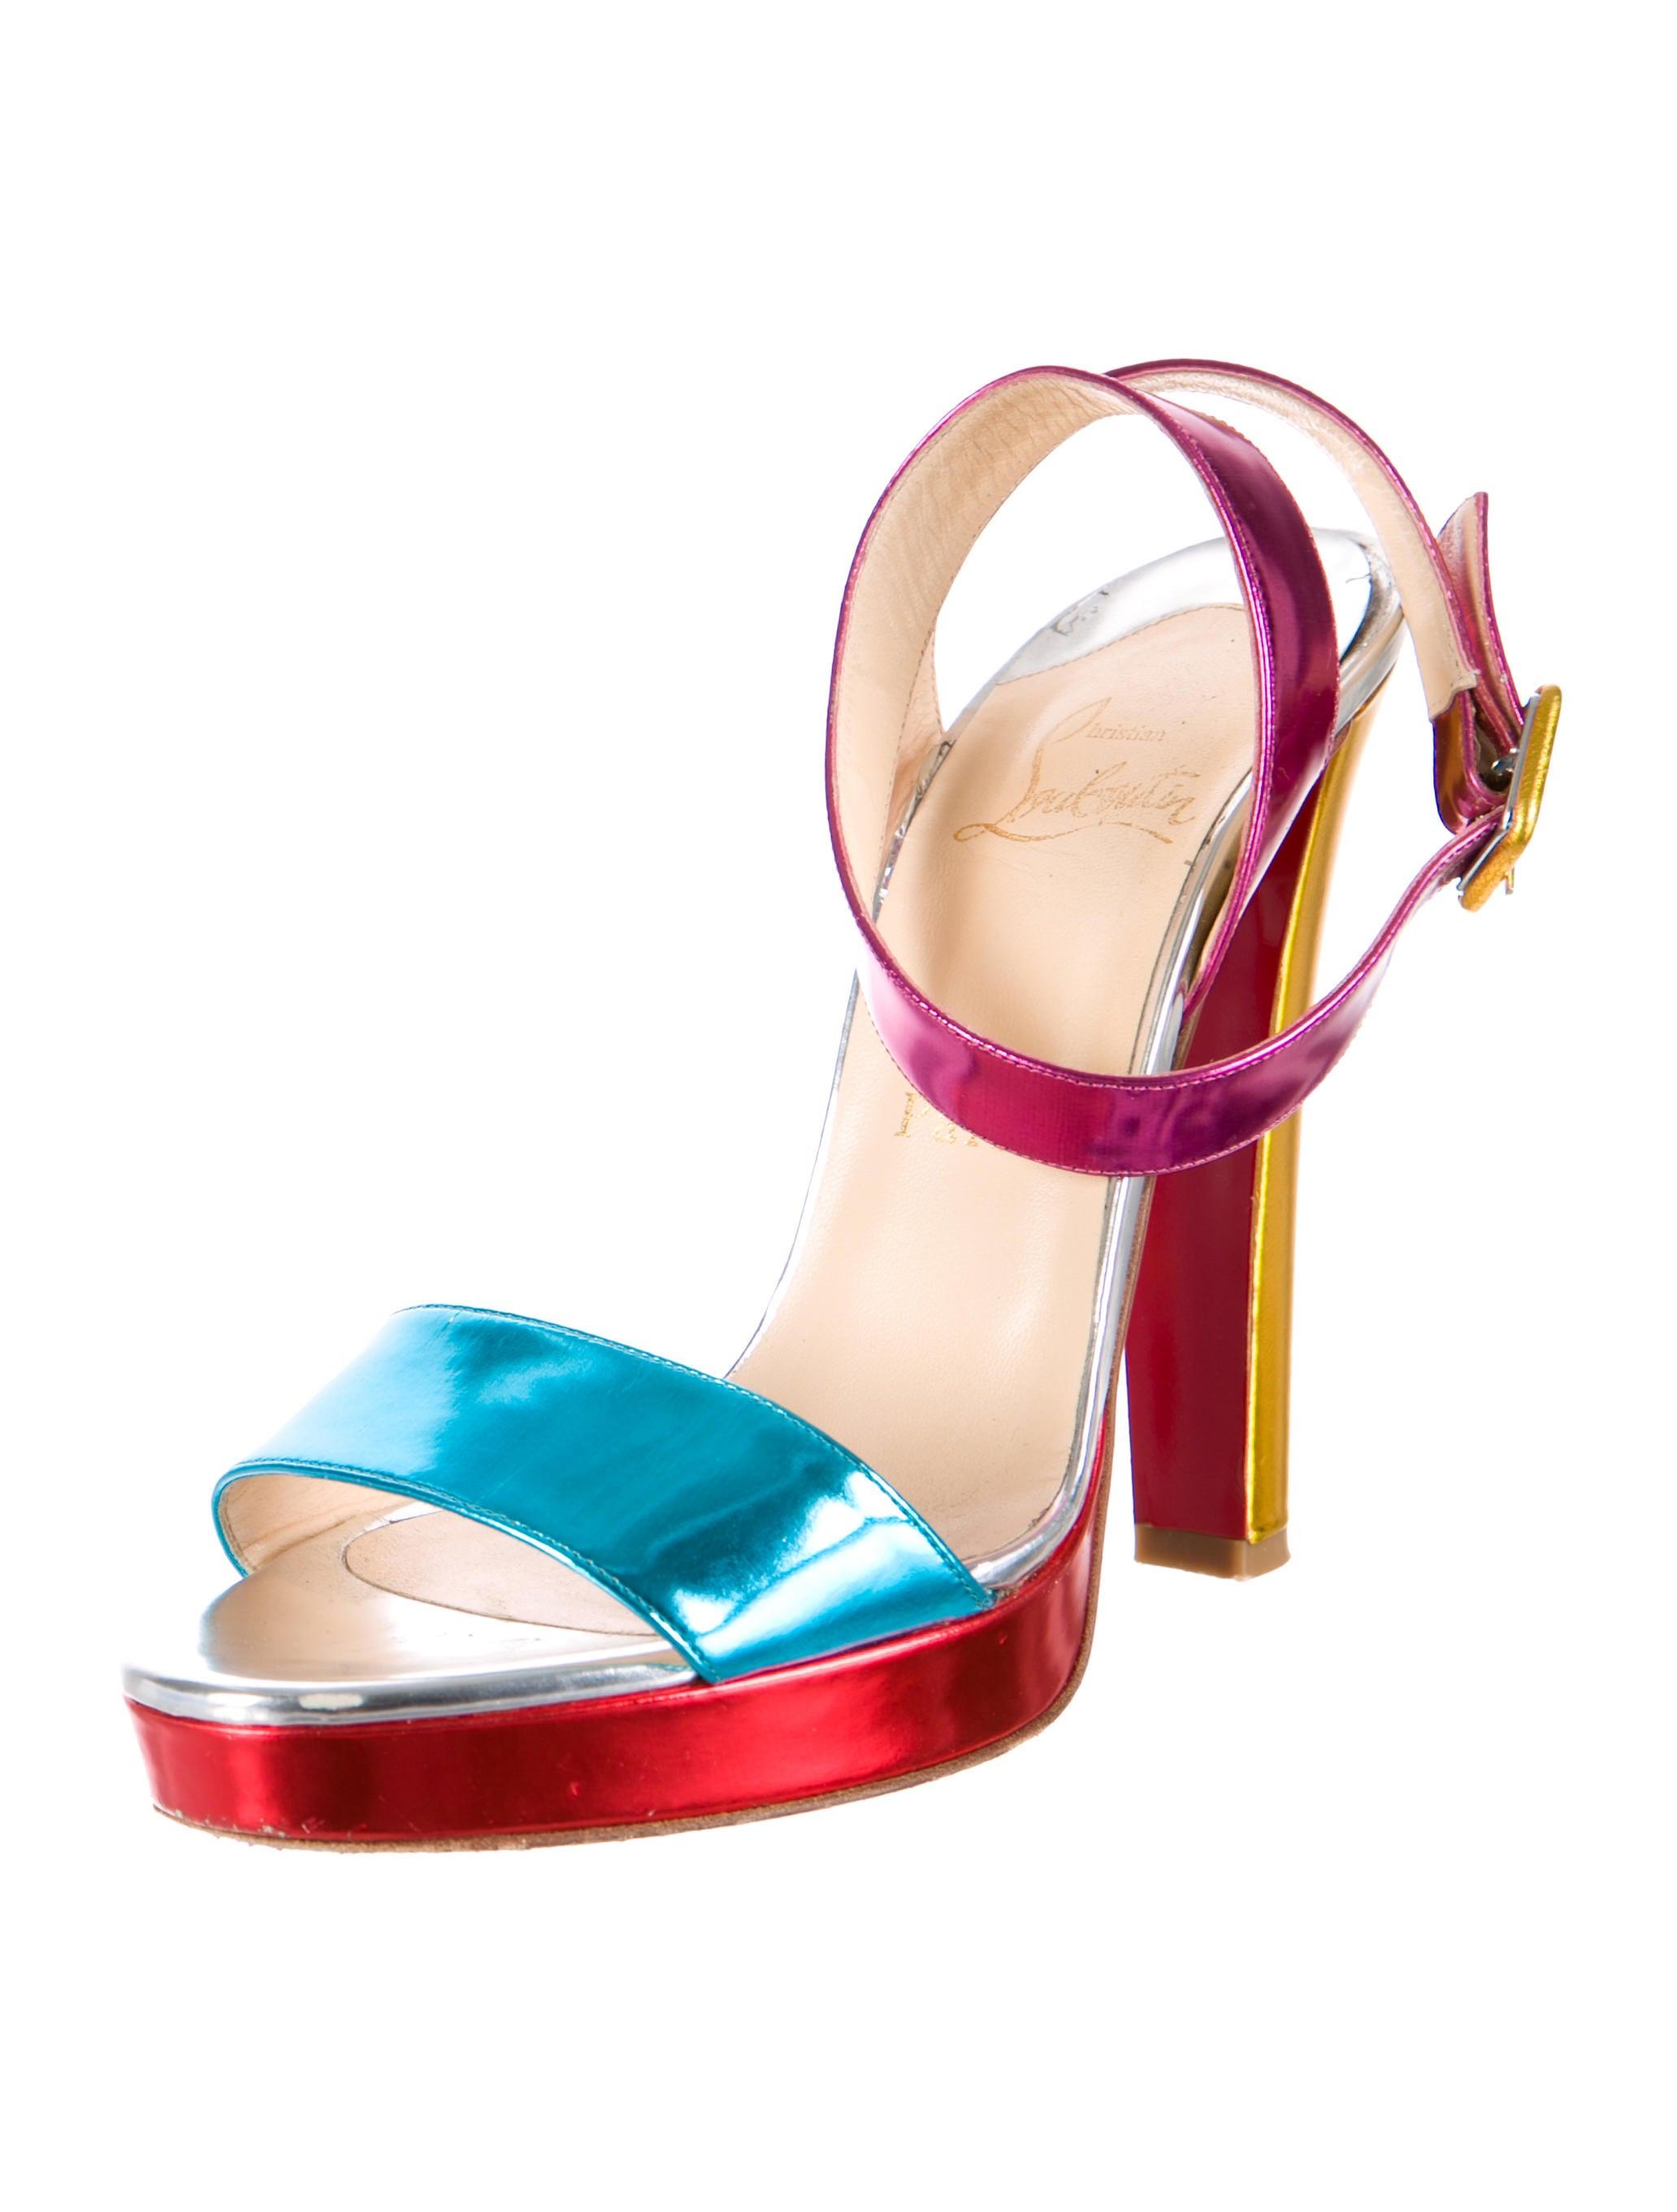 Christian Louboutin Metallic Colorblock Platform Sandals